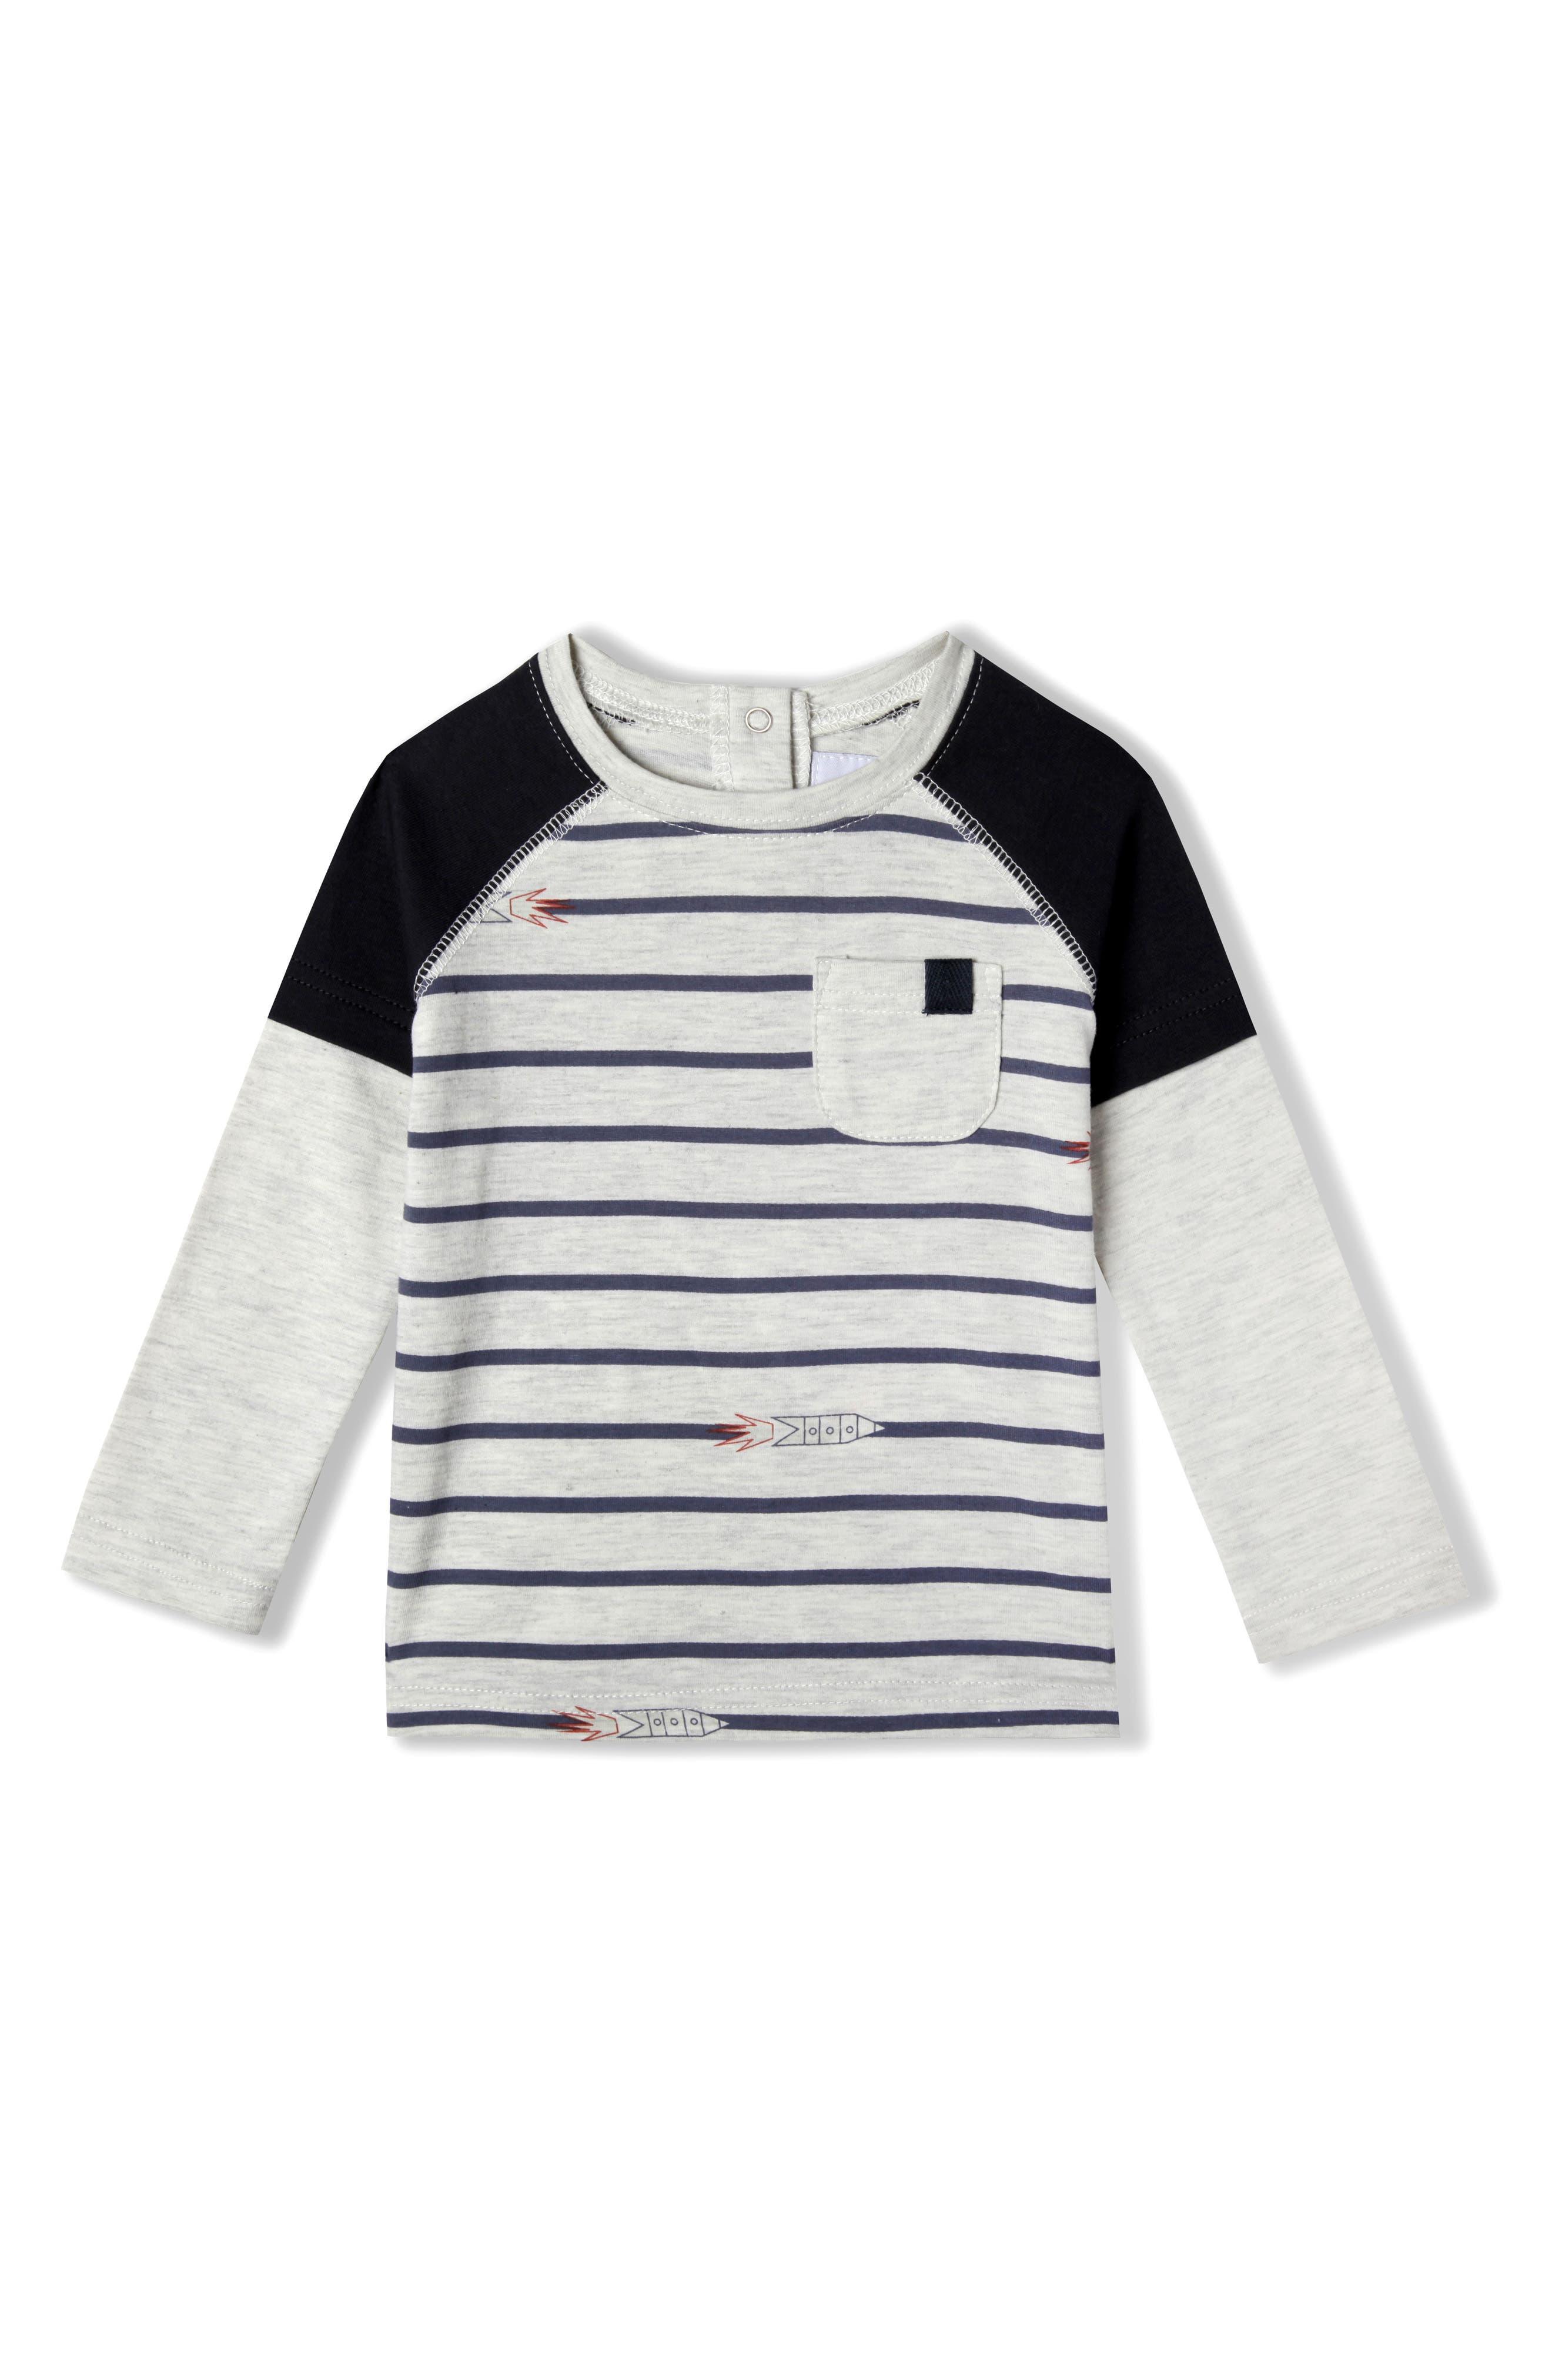 Art & Eden Rocket Organic Cotton T-Shirt (Baby Boys)